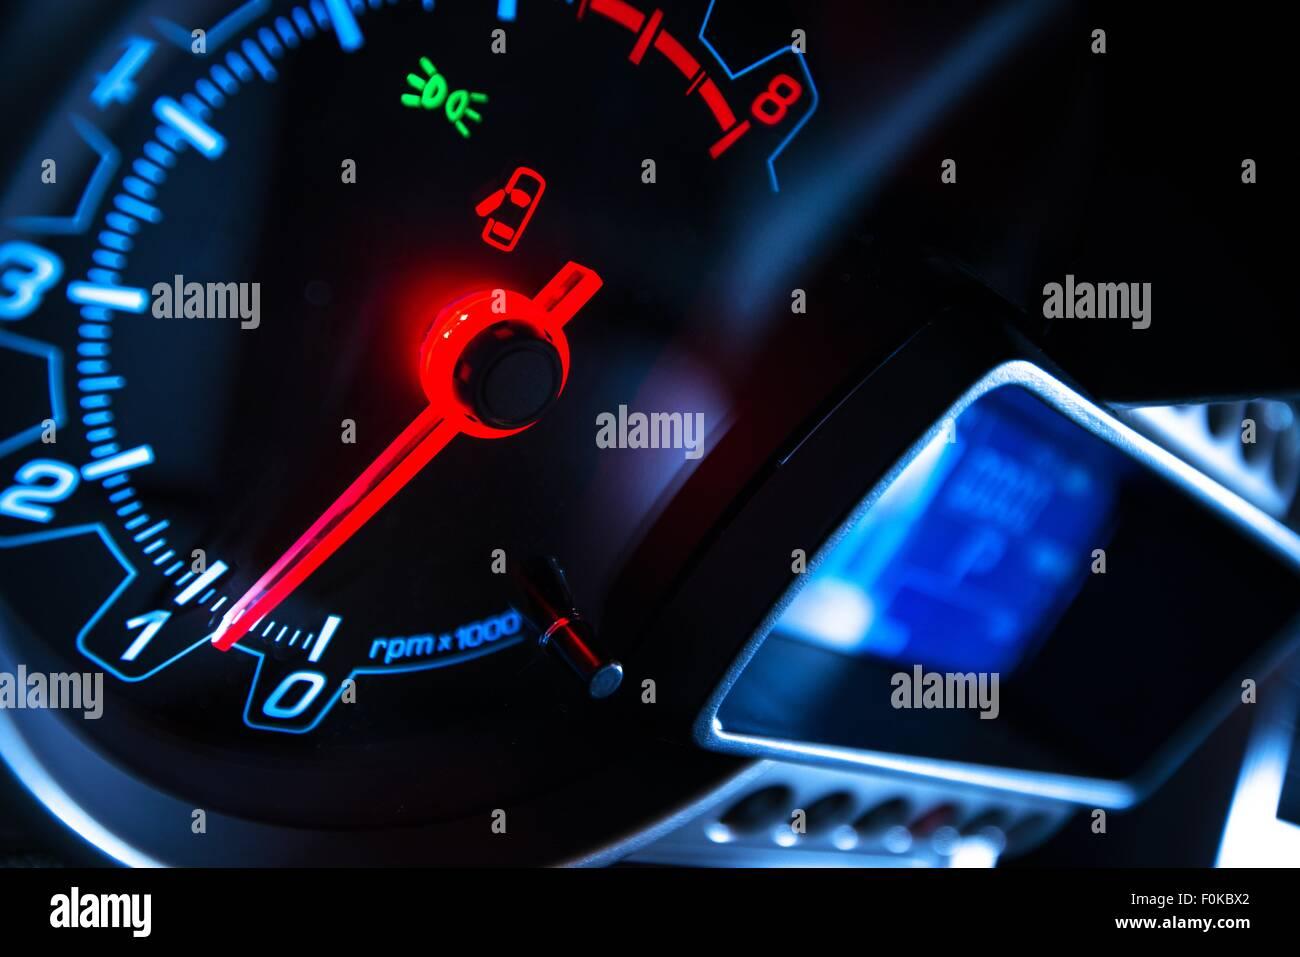 Moderne digitale Armaturenbrett mit Drehzahlmesser. Autofahren-Konzept. Stockbild